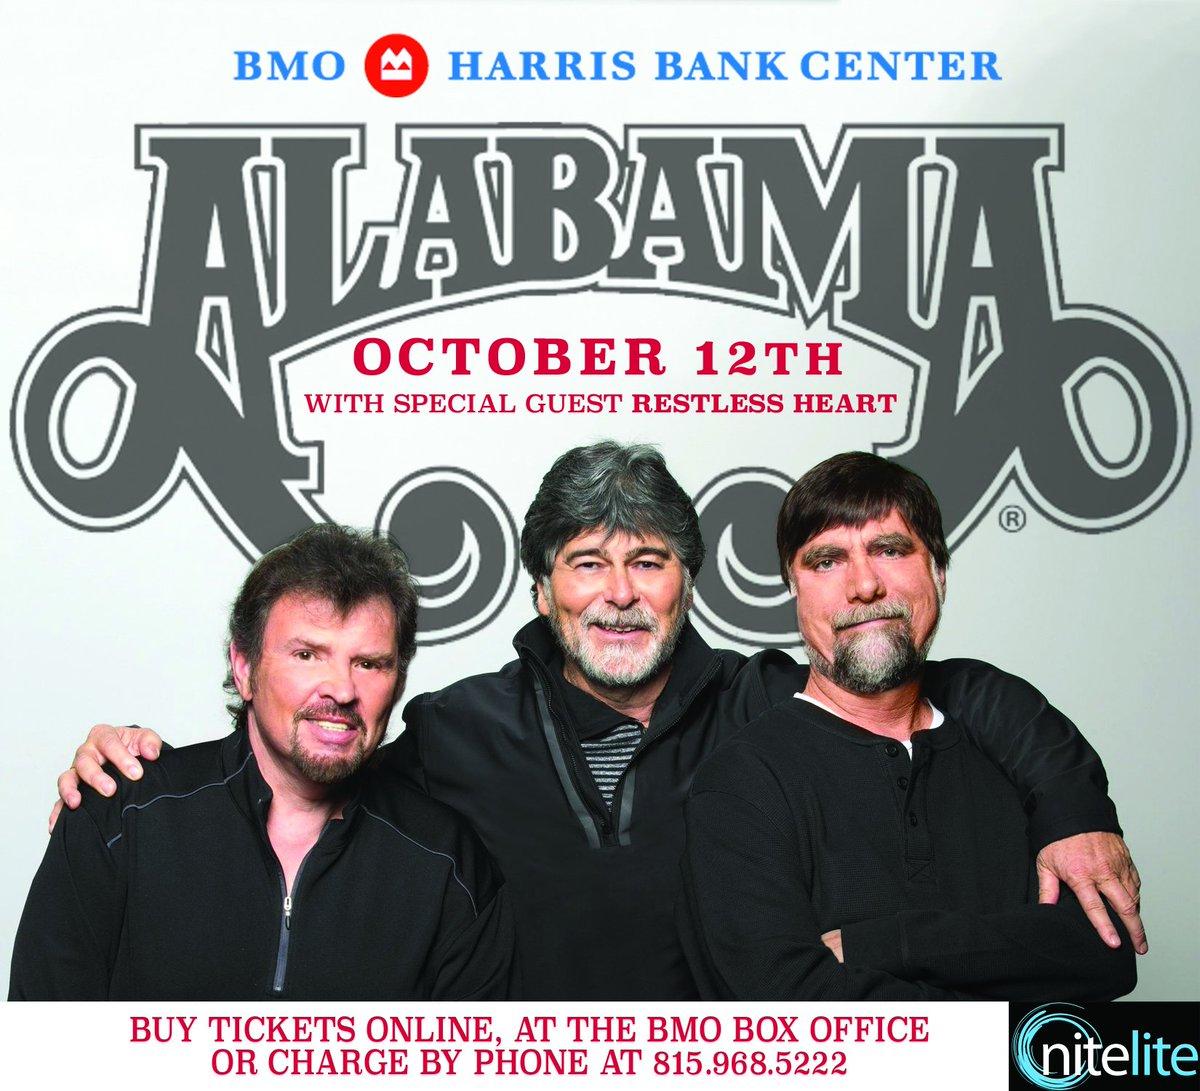 Alabama On Twitter Illinois 1 Weekend 2 Shows